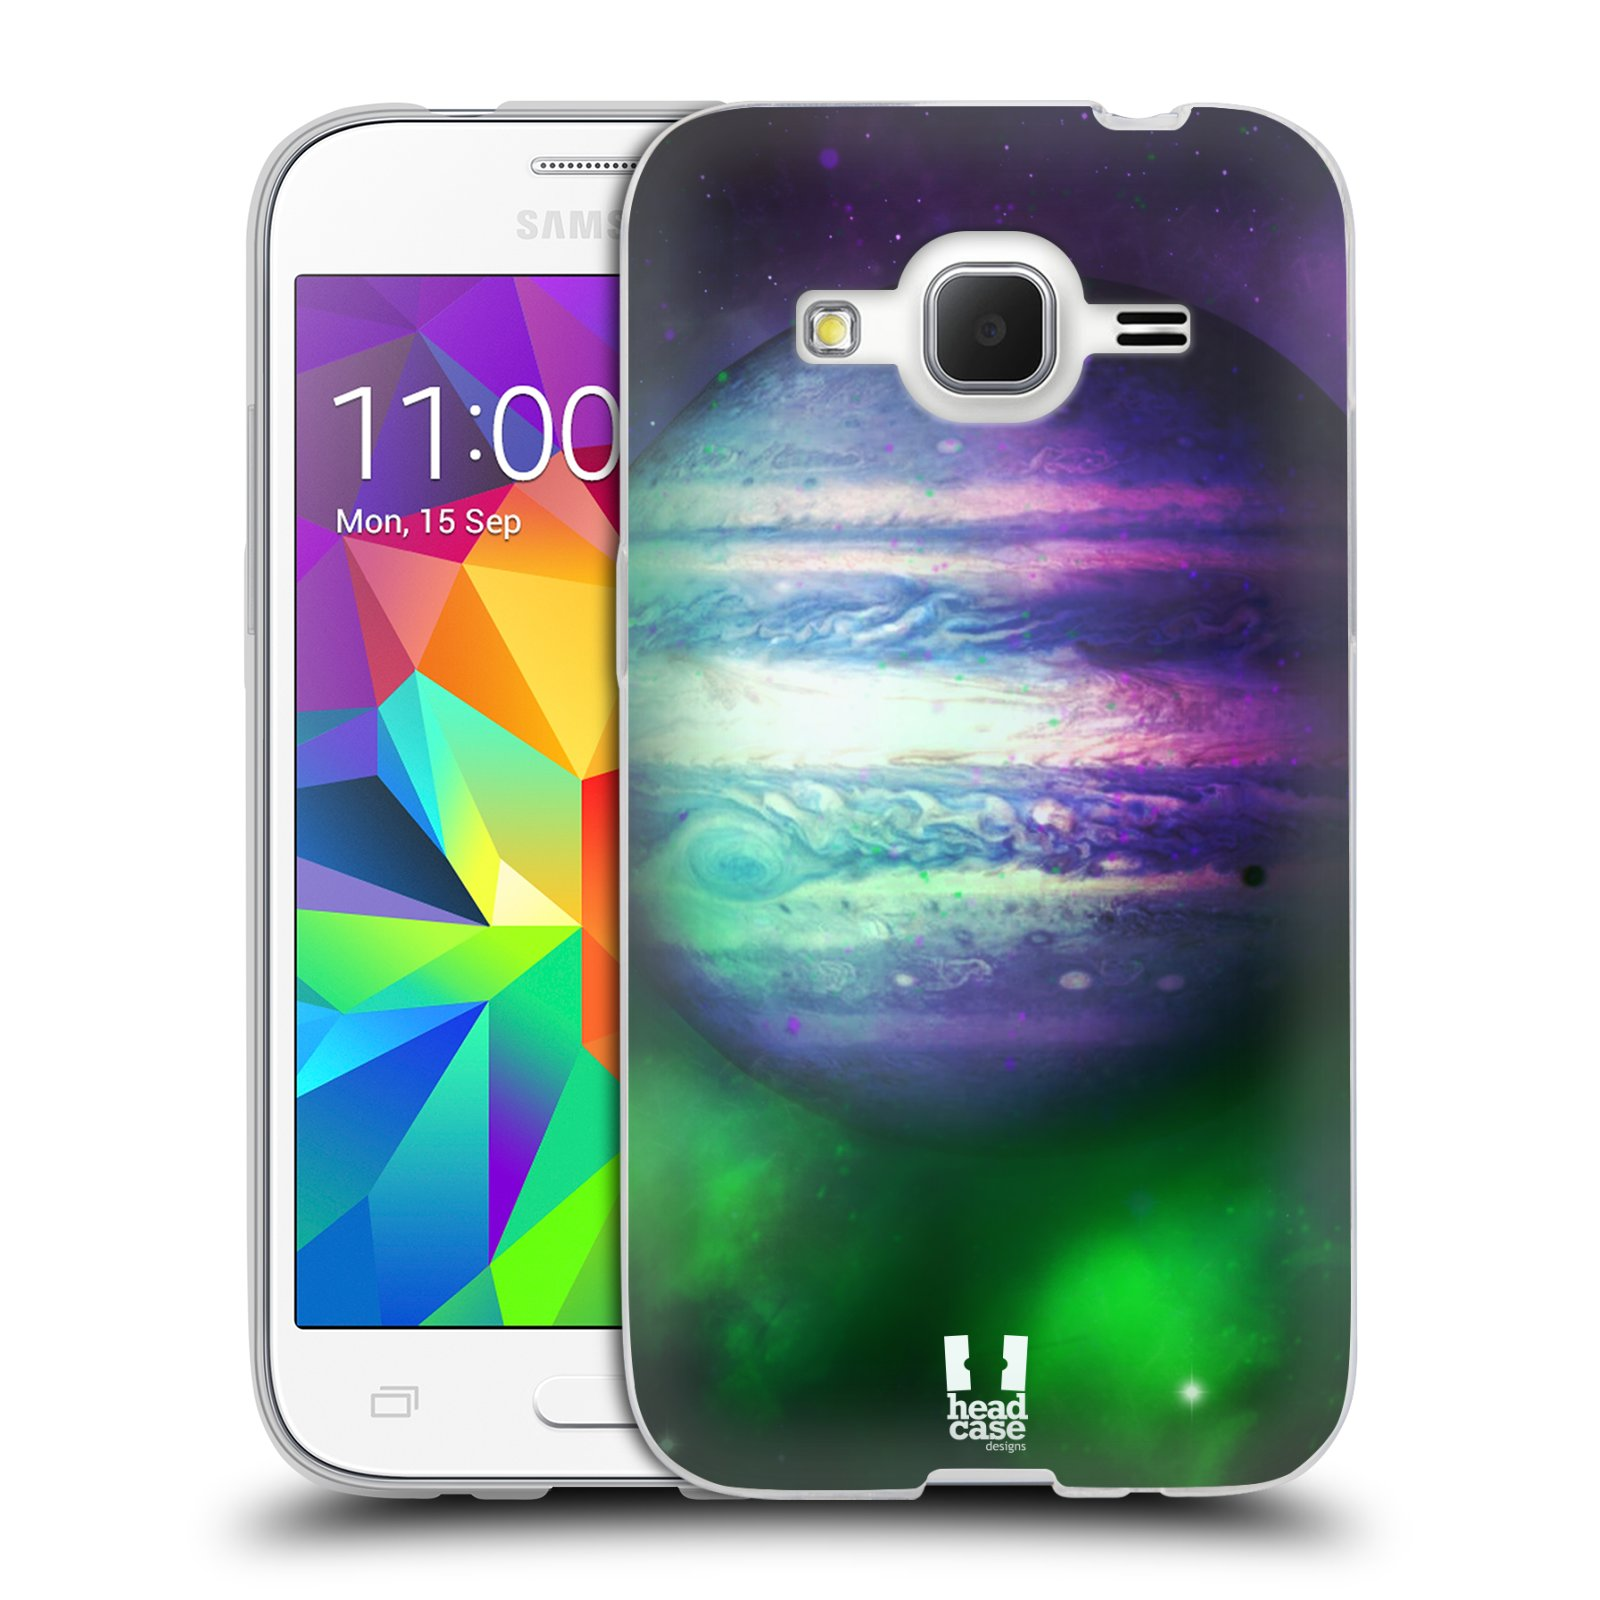 HEAD CASE silikonový obal na mobil Samsung Galaxy Core Prime (G360) vzor Vesmírná krása JUPITER MODRÁ